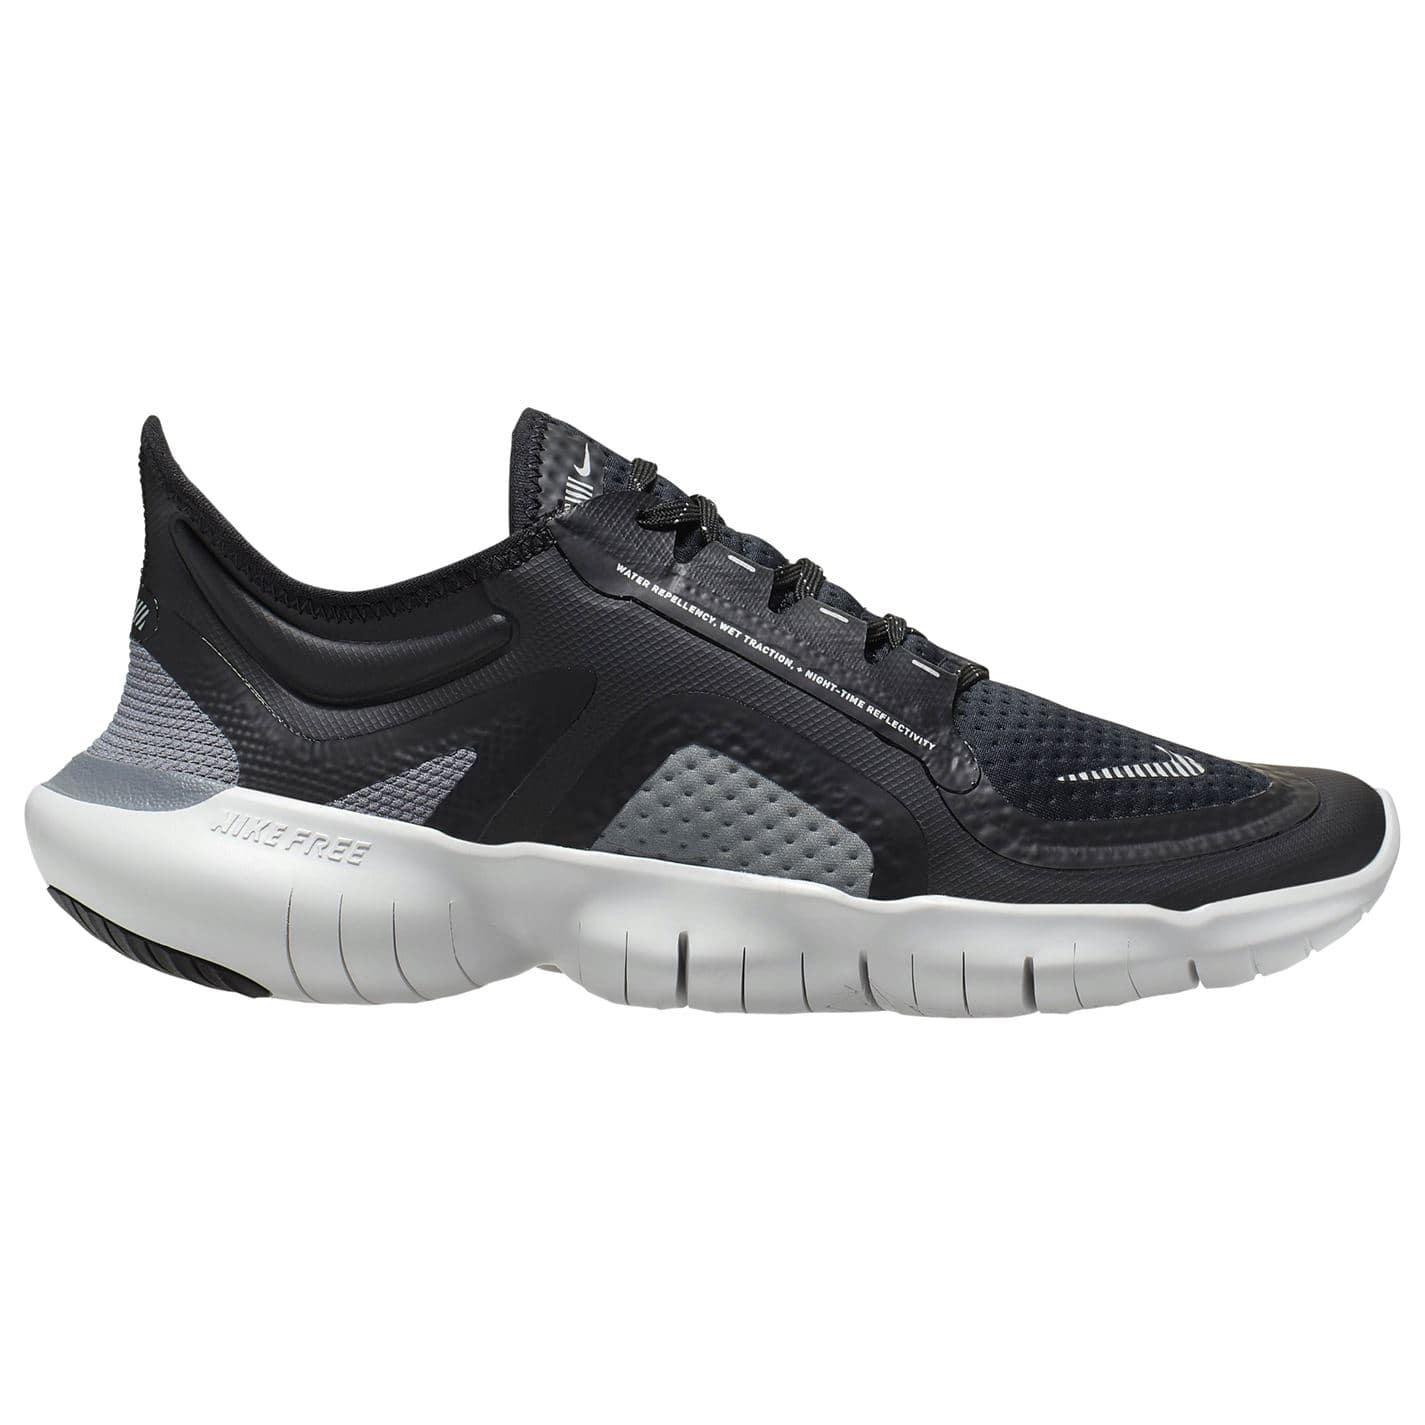 Nike Free Rn 5.0 SH Ld94